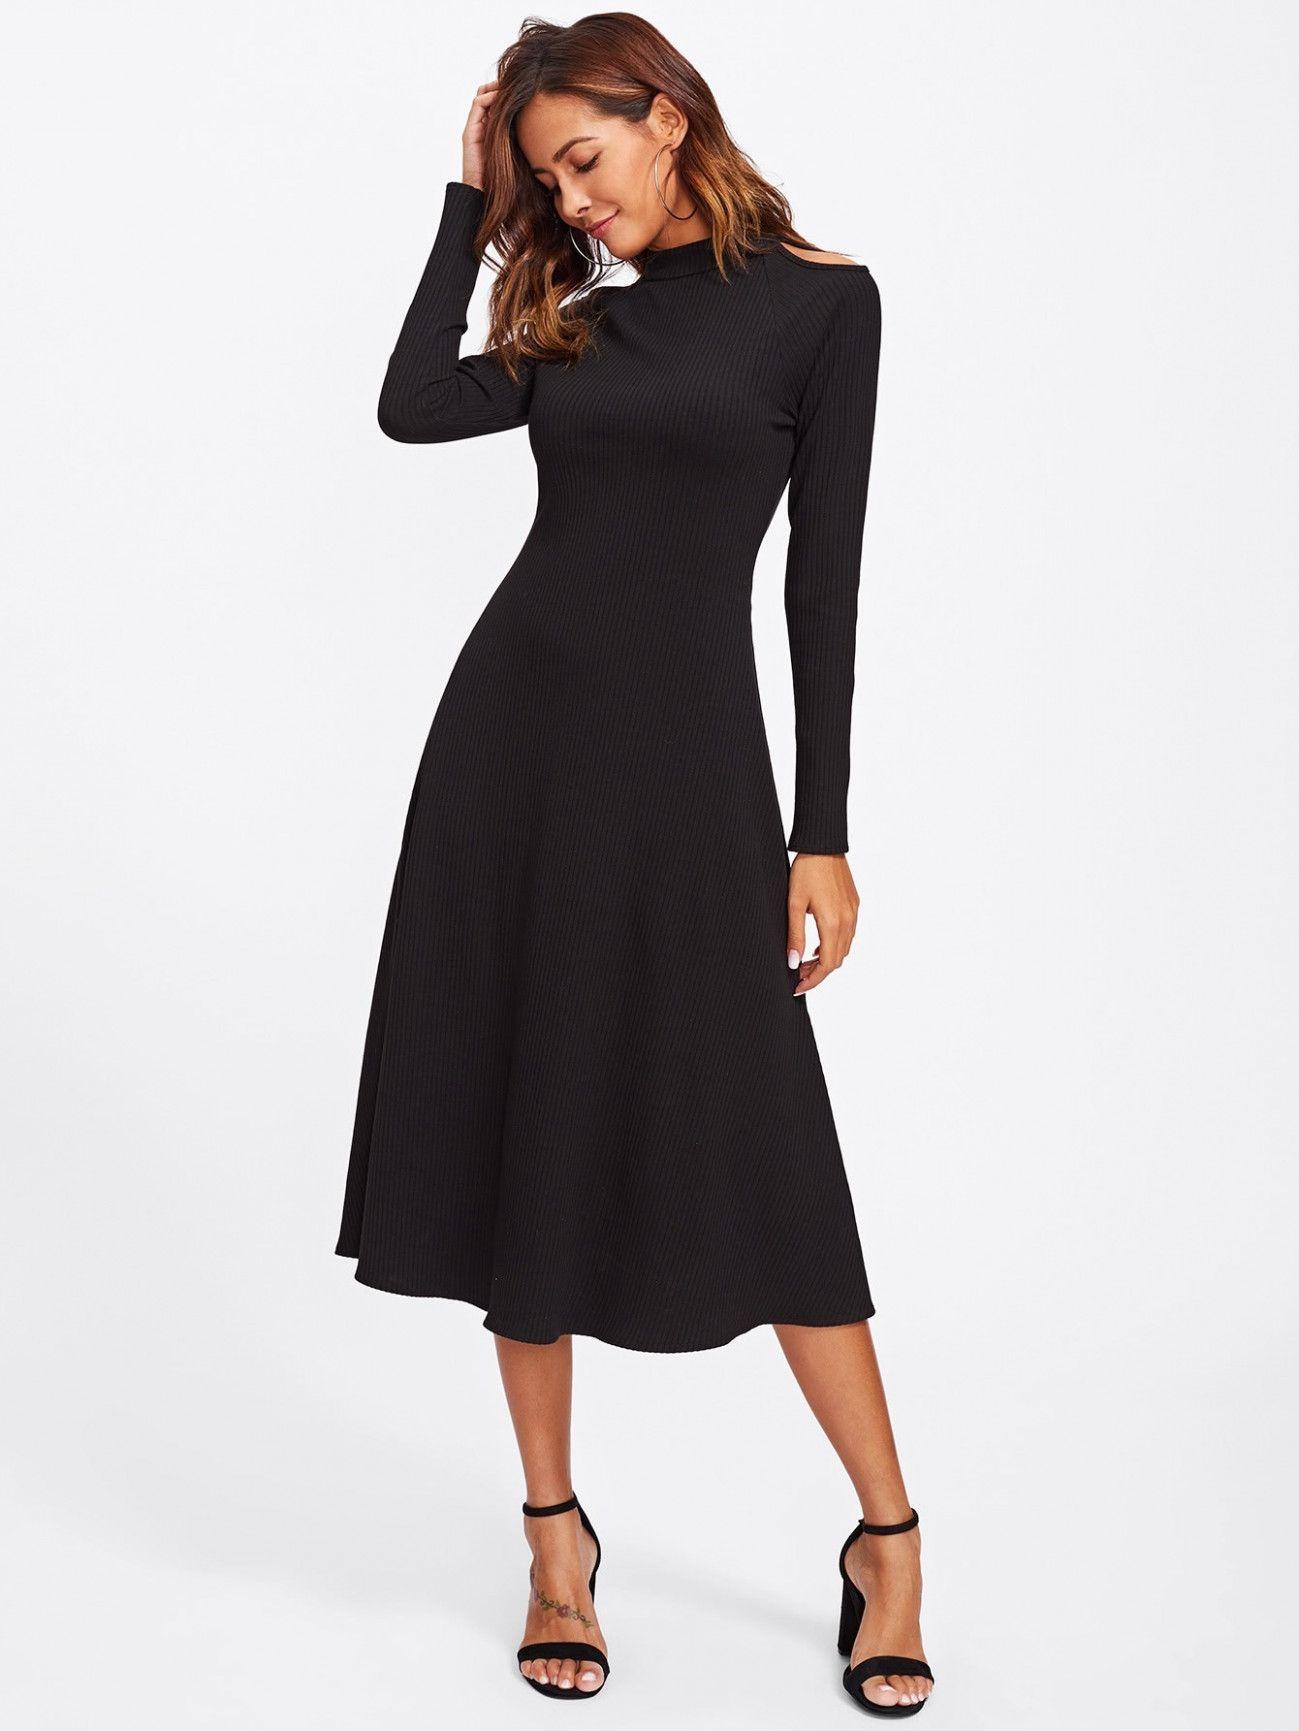 15 schwarzes langarm kleid | kleid spitze, kleid schwarz